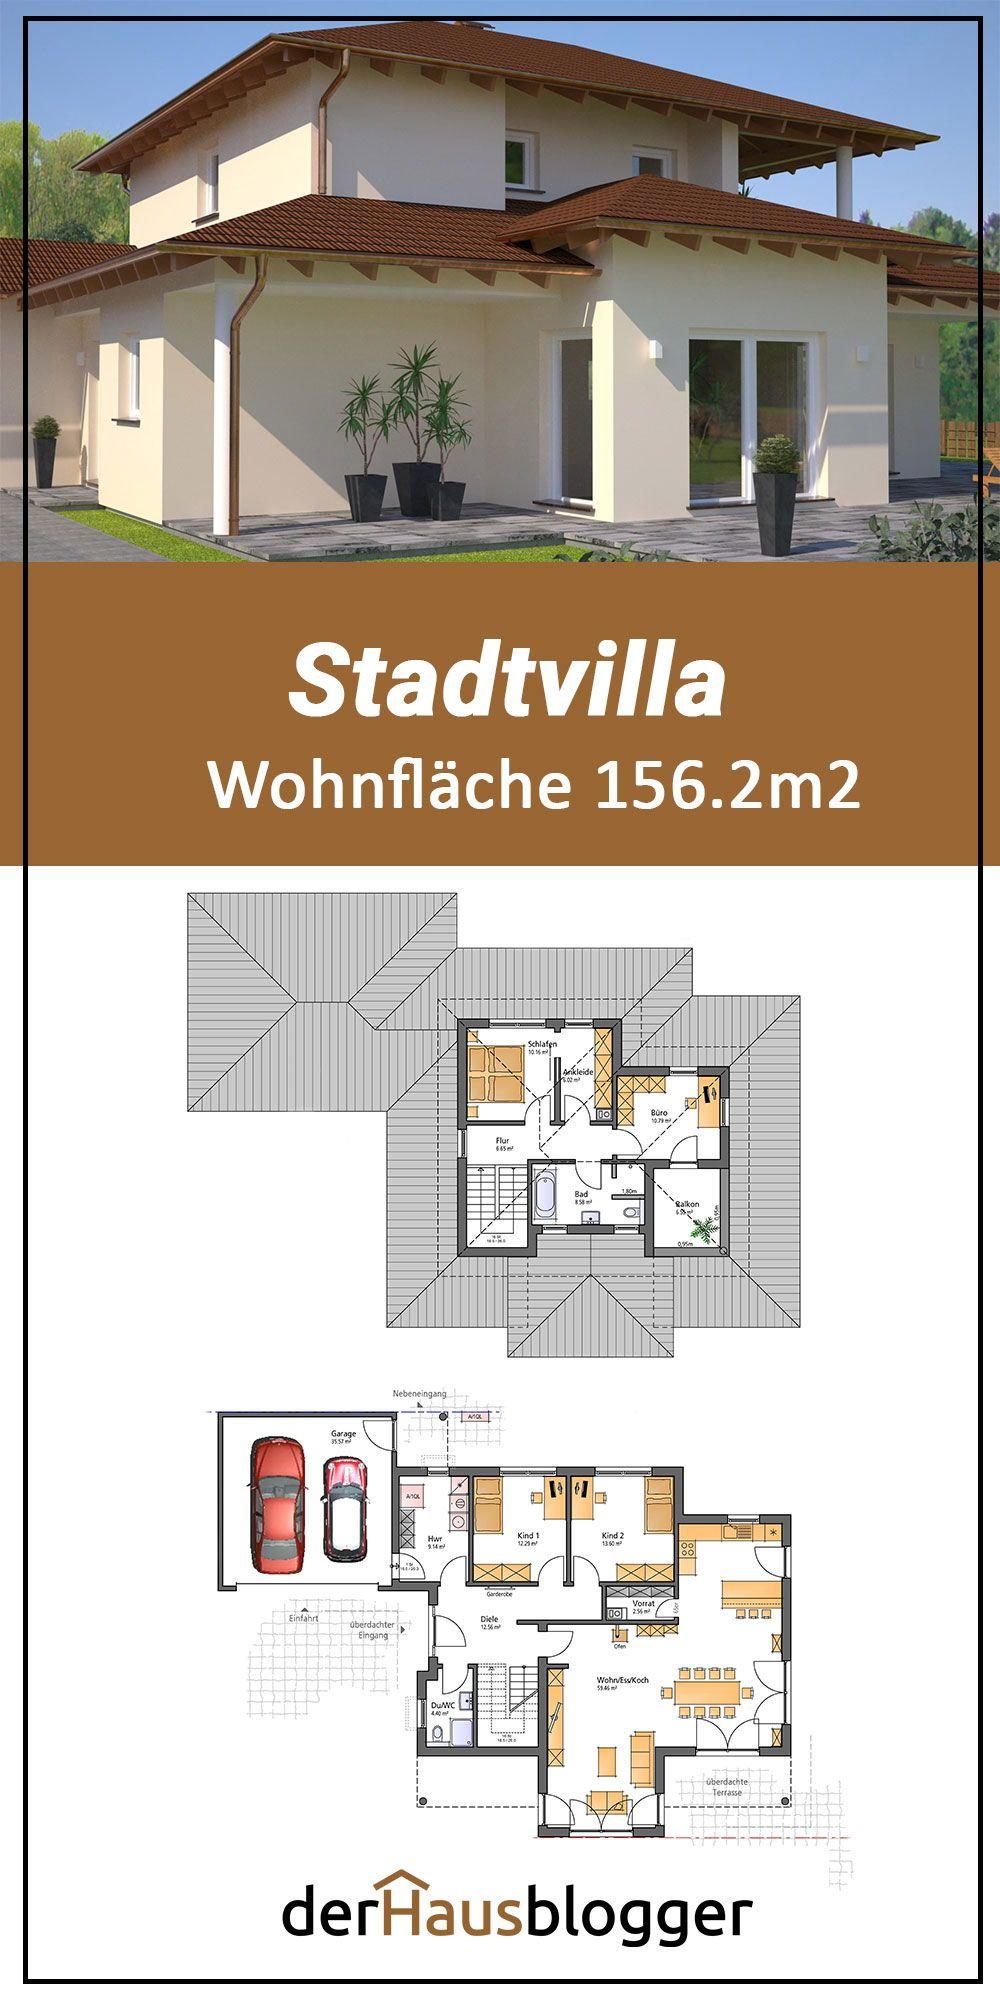 Stadtvilla 156.2m² in 2020 Haus, Haus planung, Grundriss